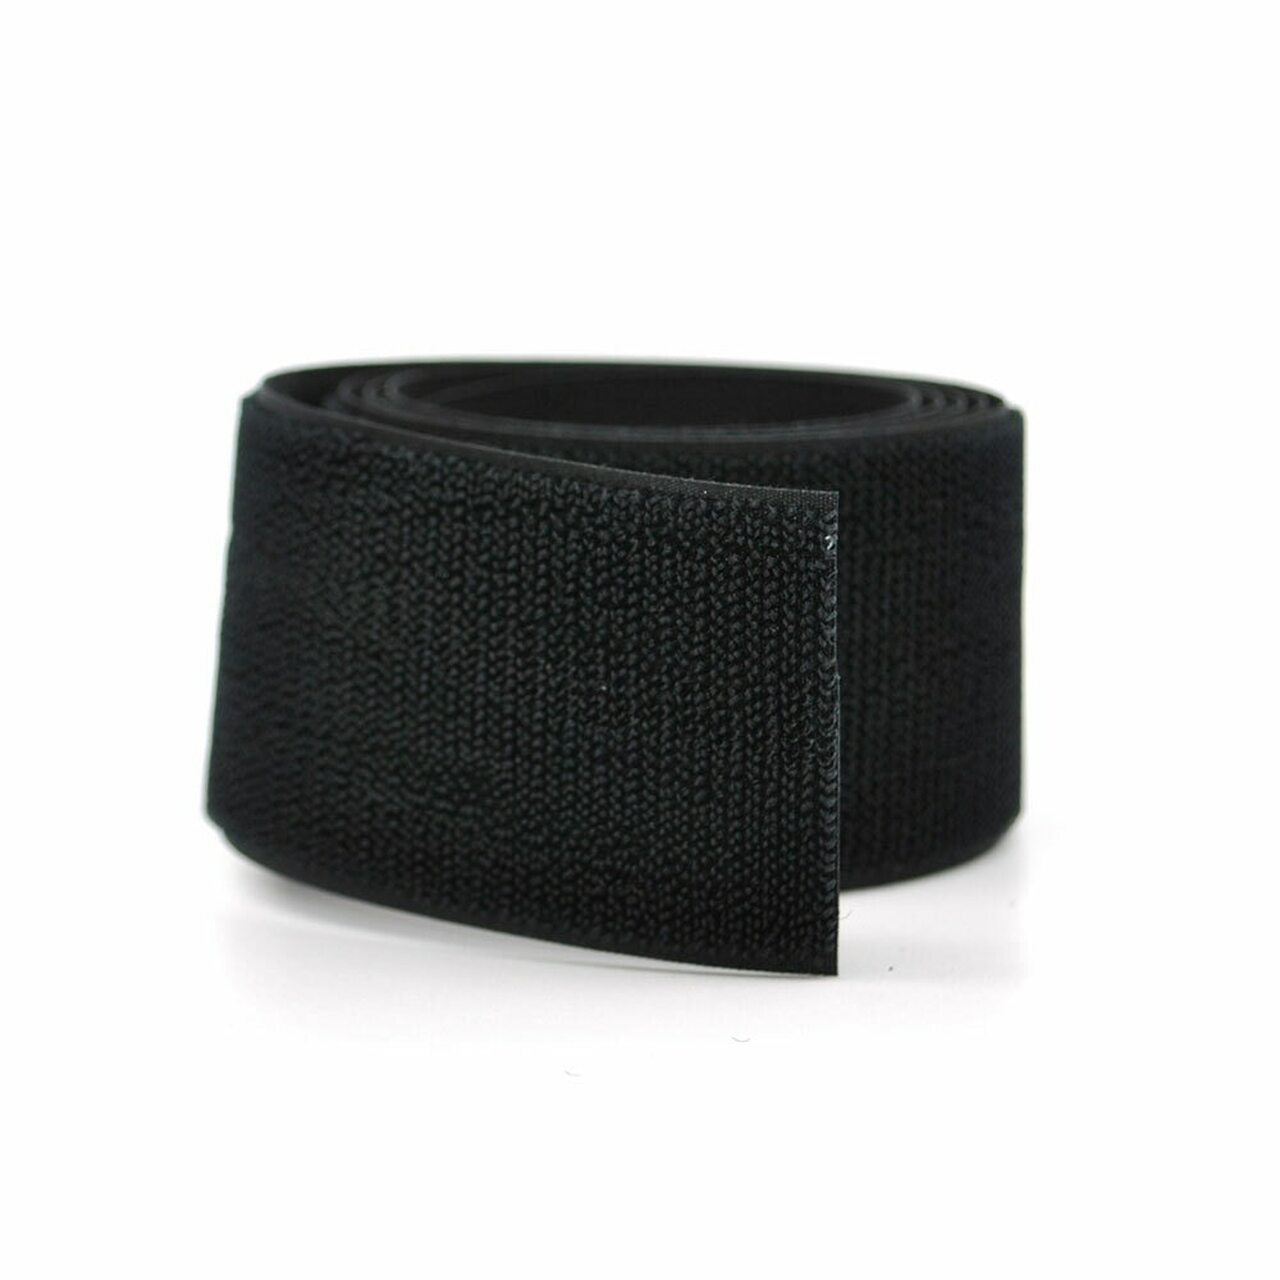 VELCRO Brand Polyester Sew-On Tape- Mil Spec Black Loop / Velcro Fasteners